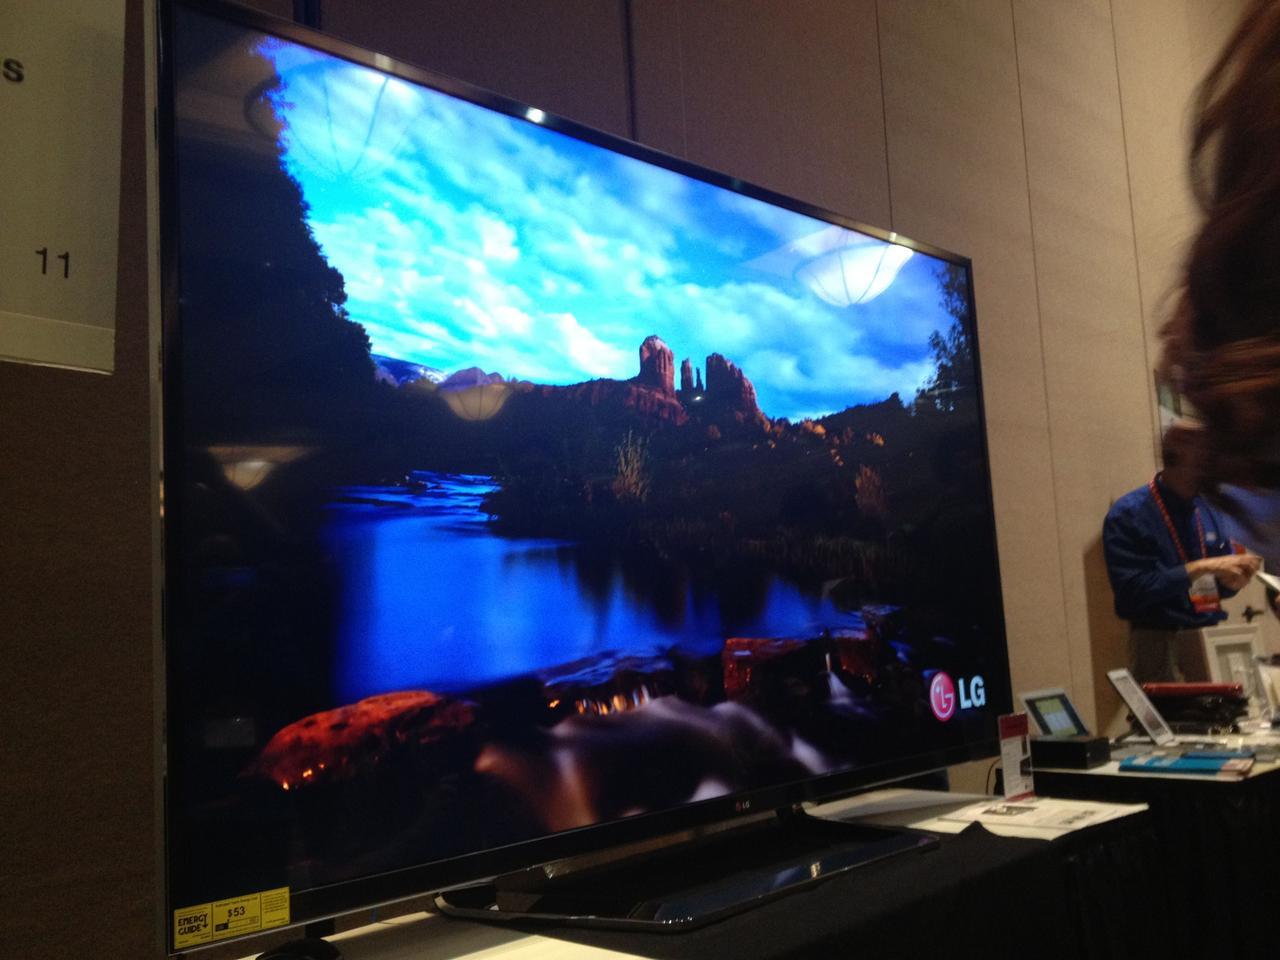 LG's 84LM960 4K 3D TV